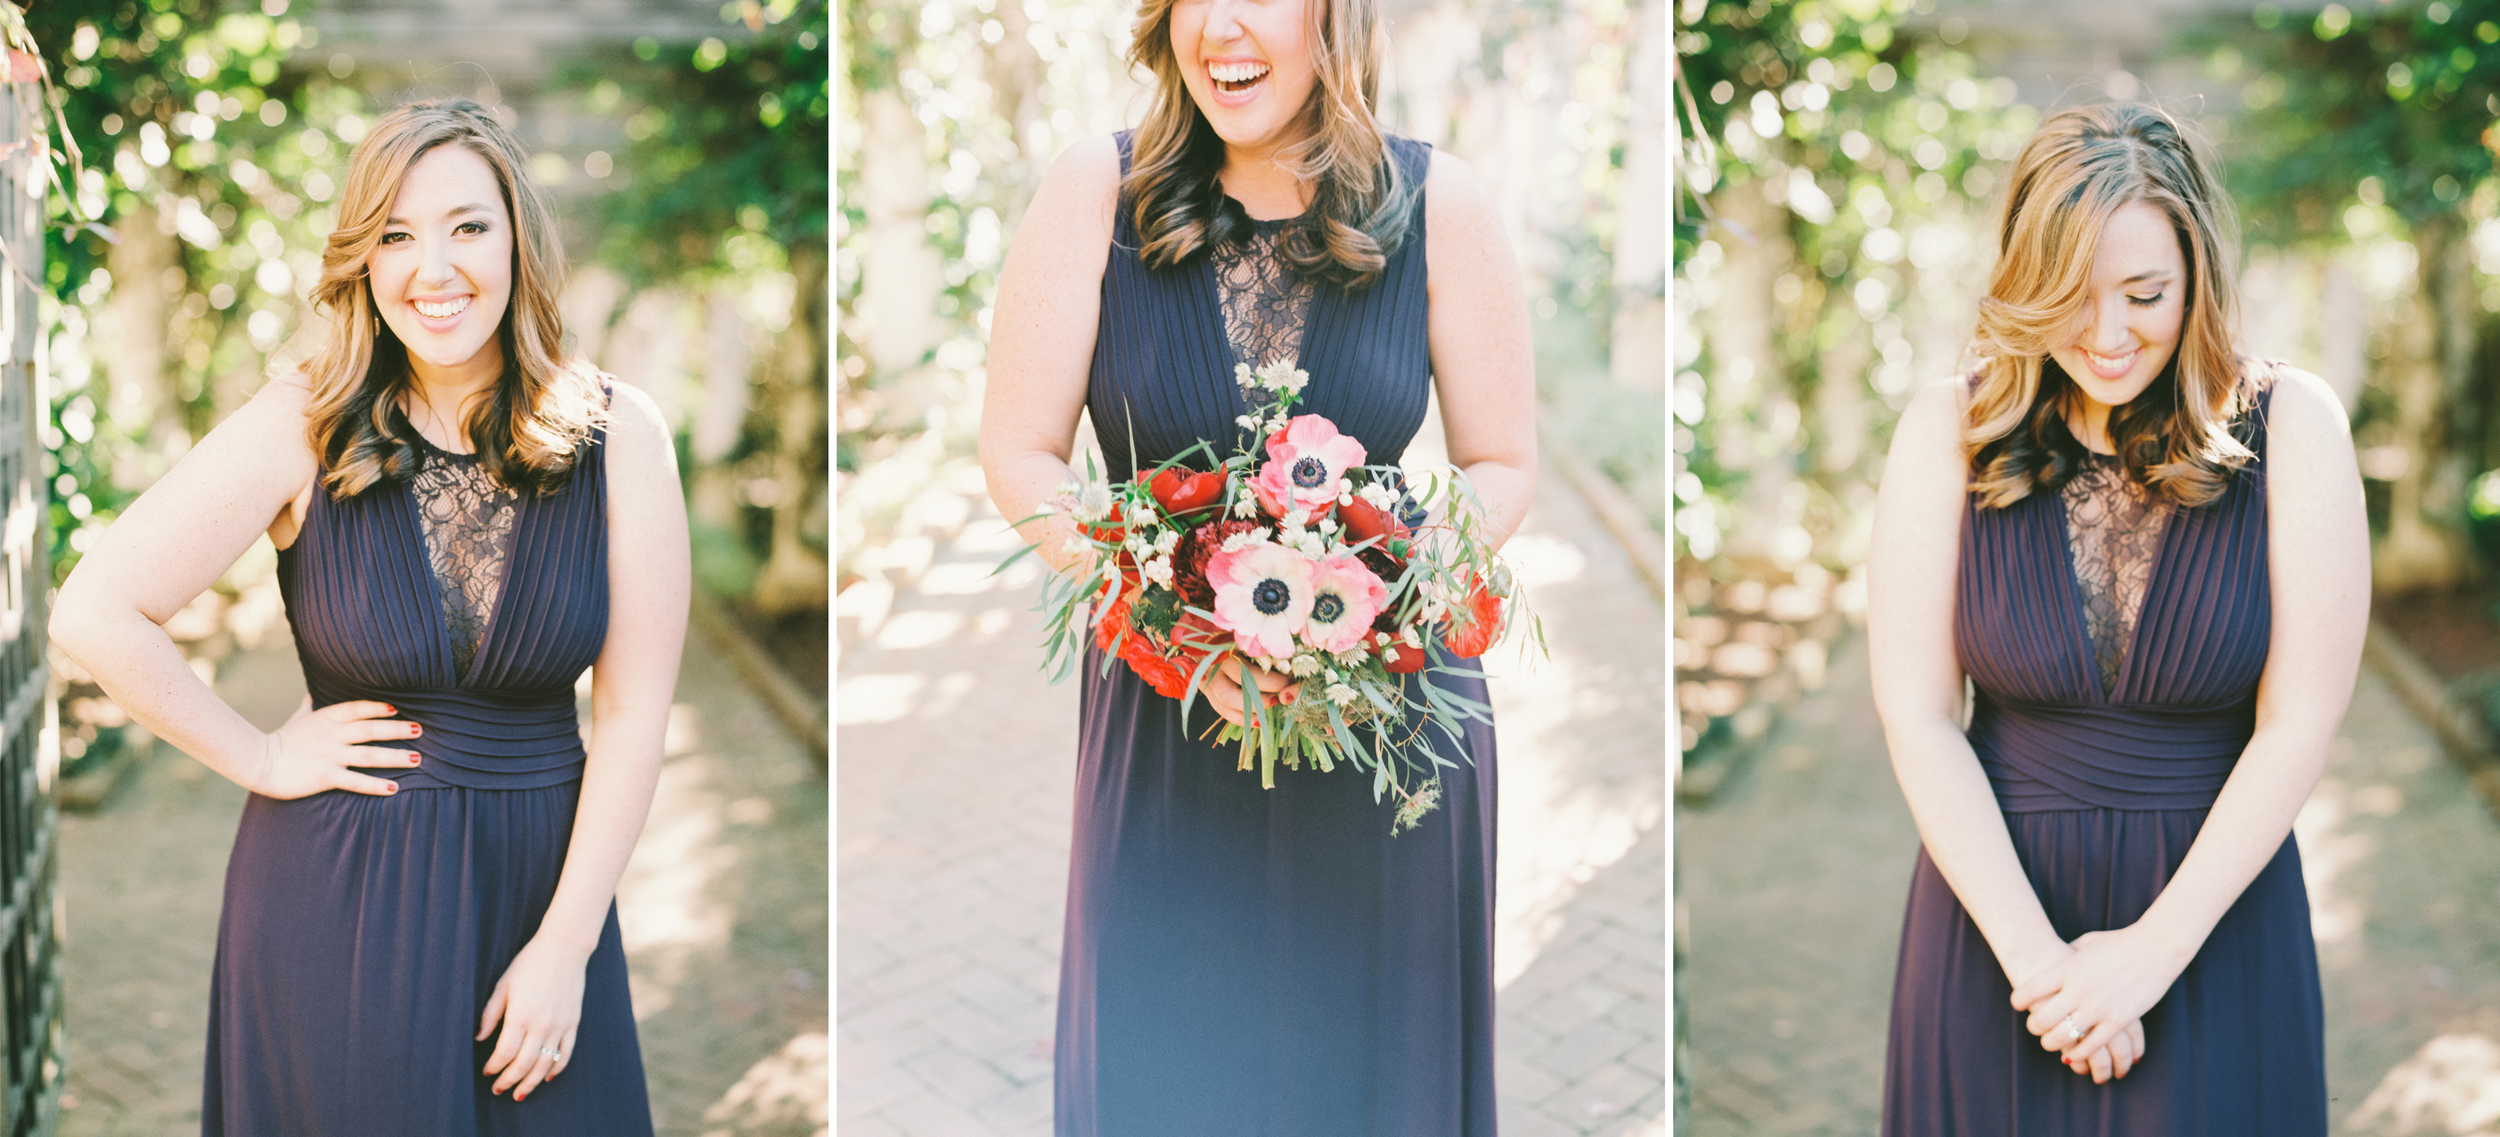 The_Graceful_Host_Wedding_Planner.jpg